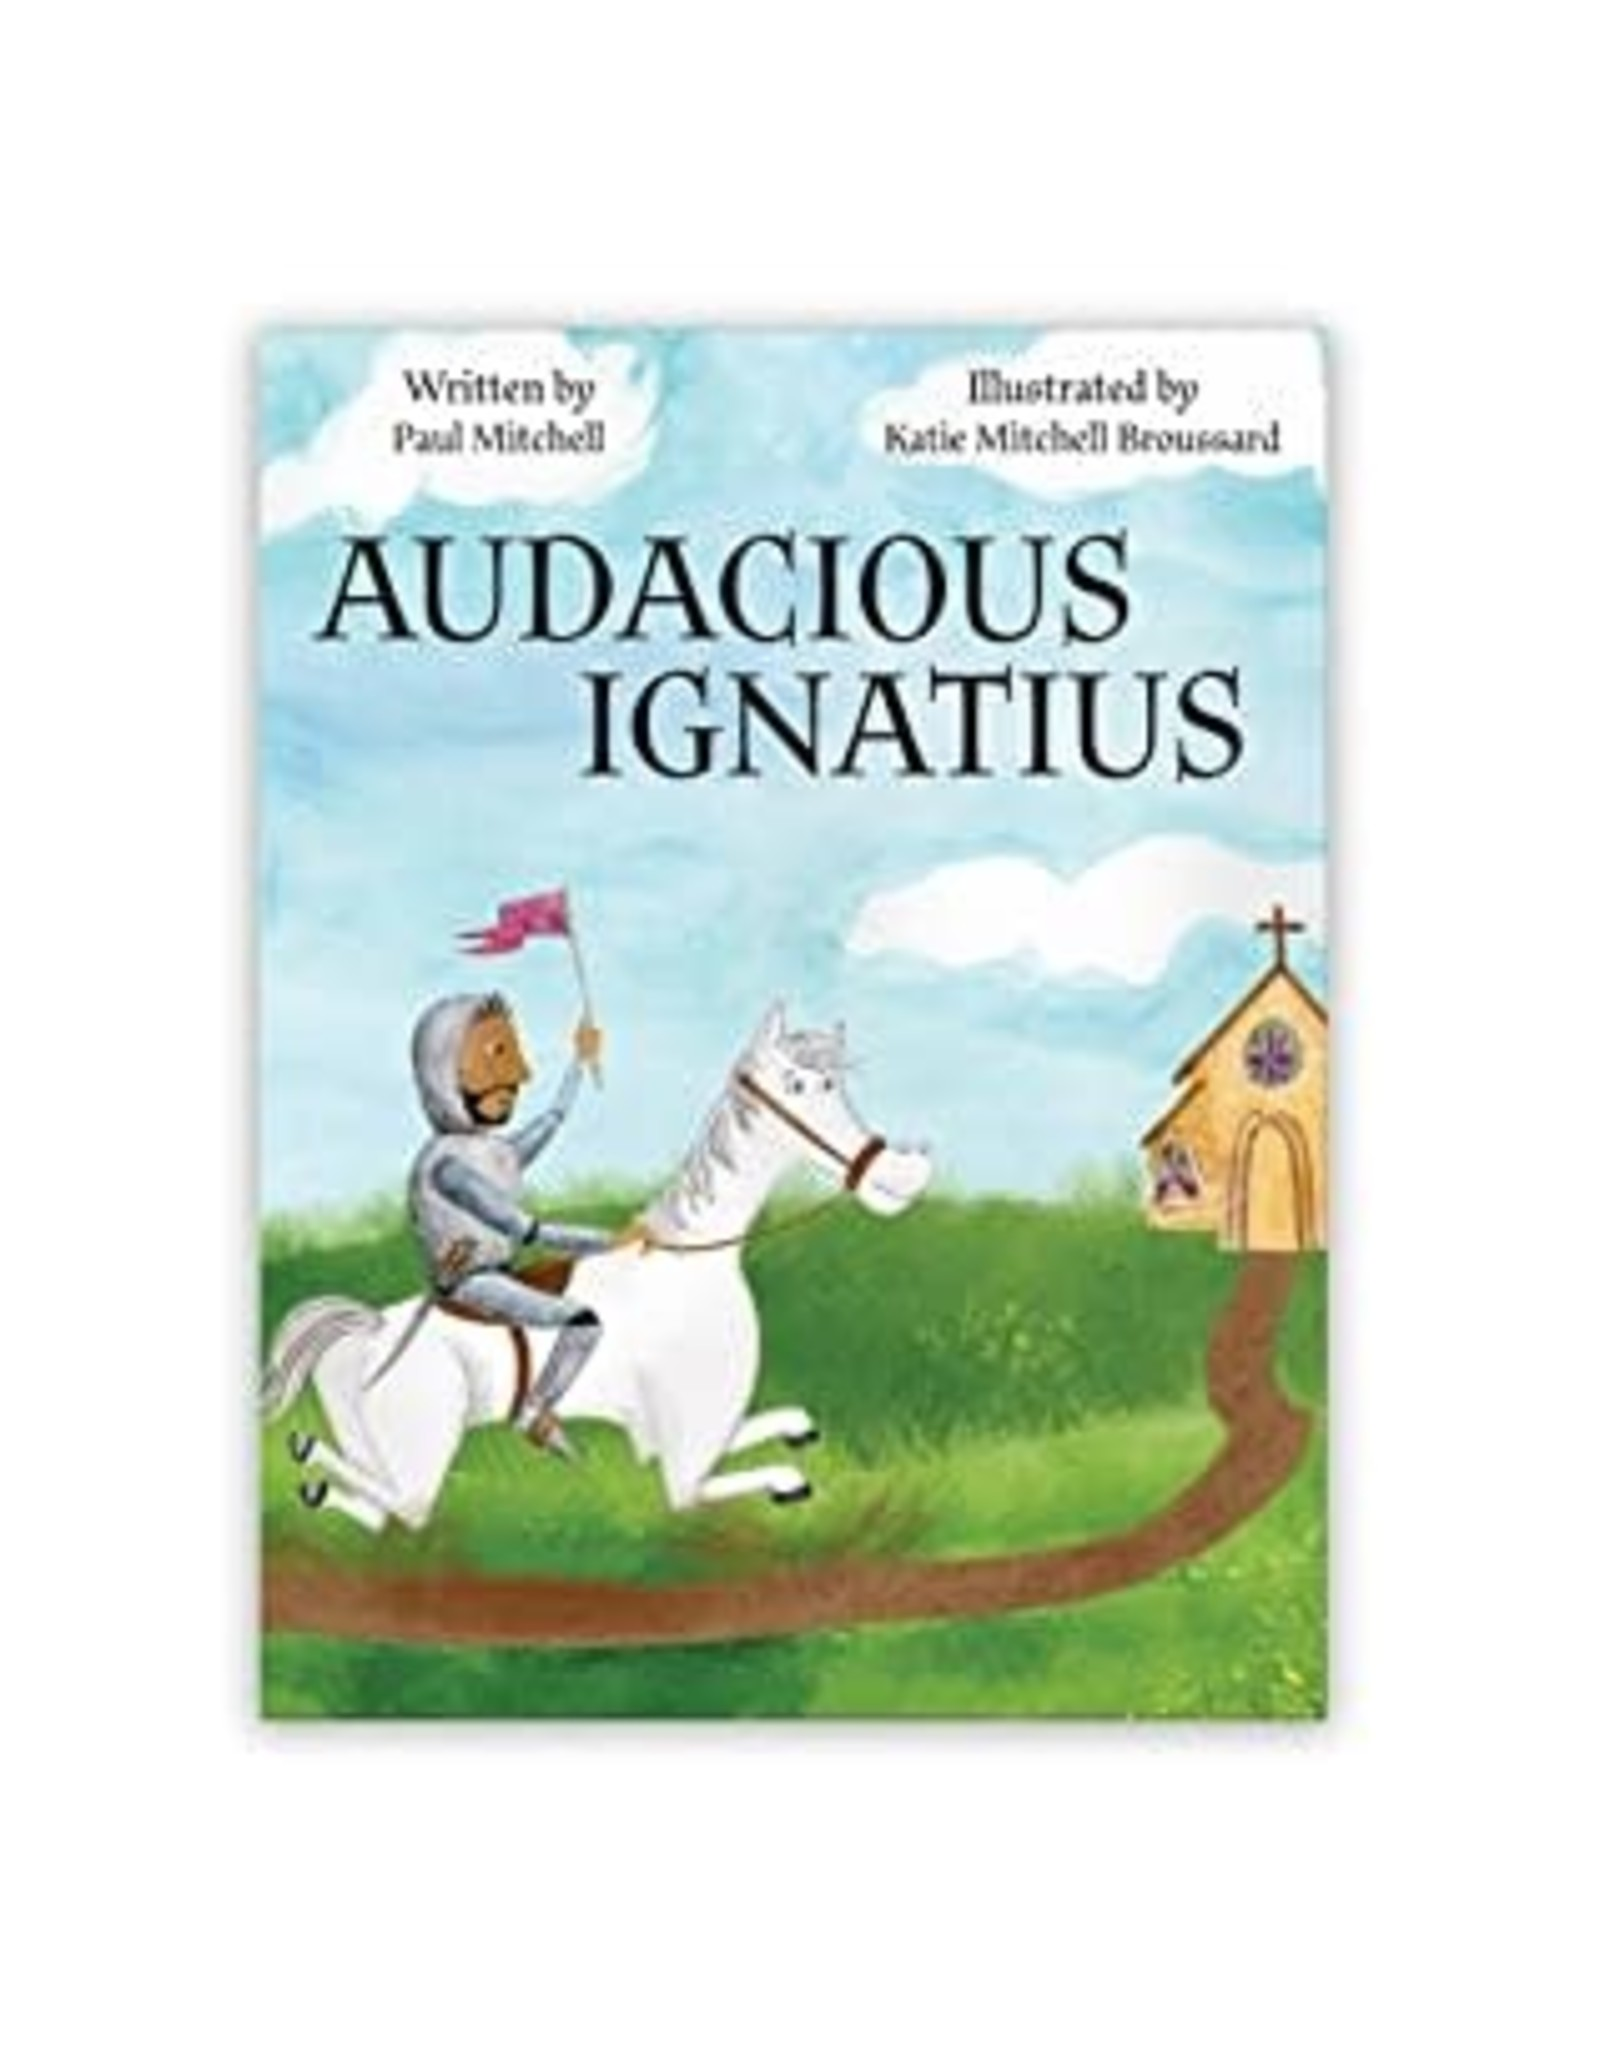 Audacious Ignatius by Paul Mitchell